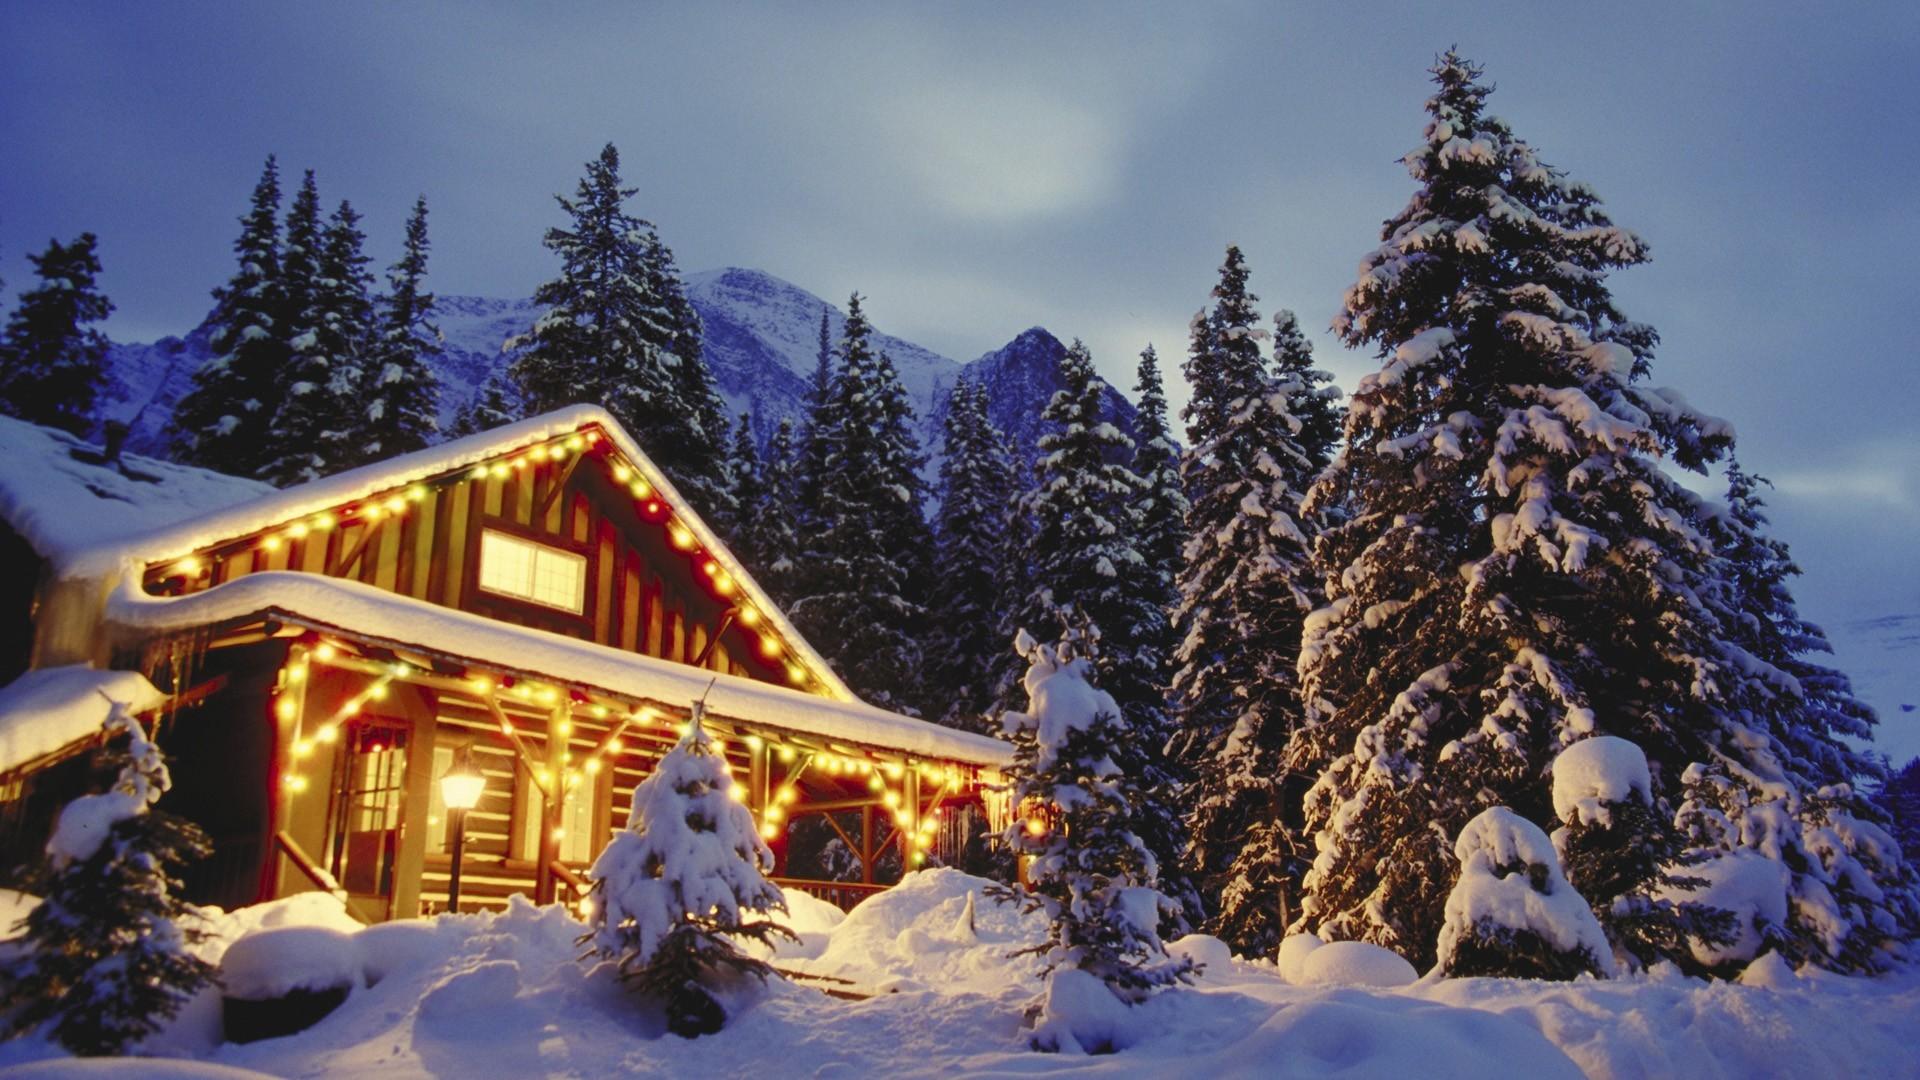 1920x1080 christmas wallpaper mountains snowy scene 1920x1080